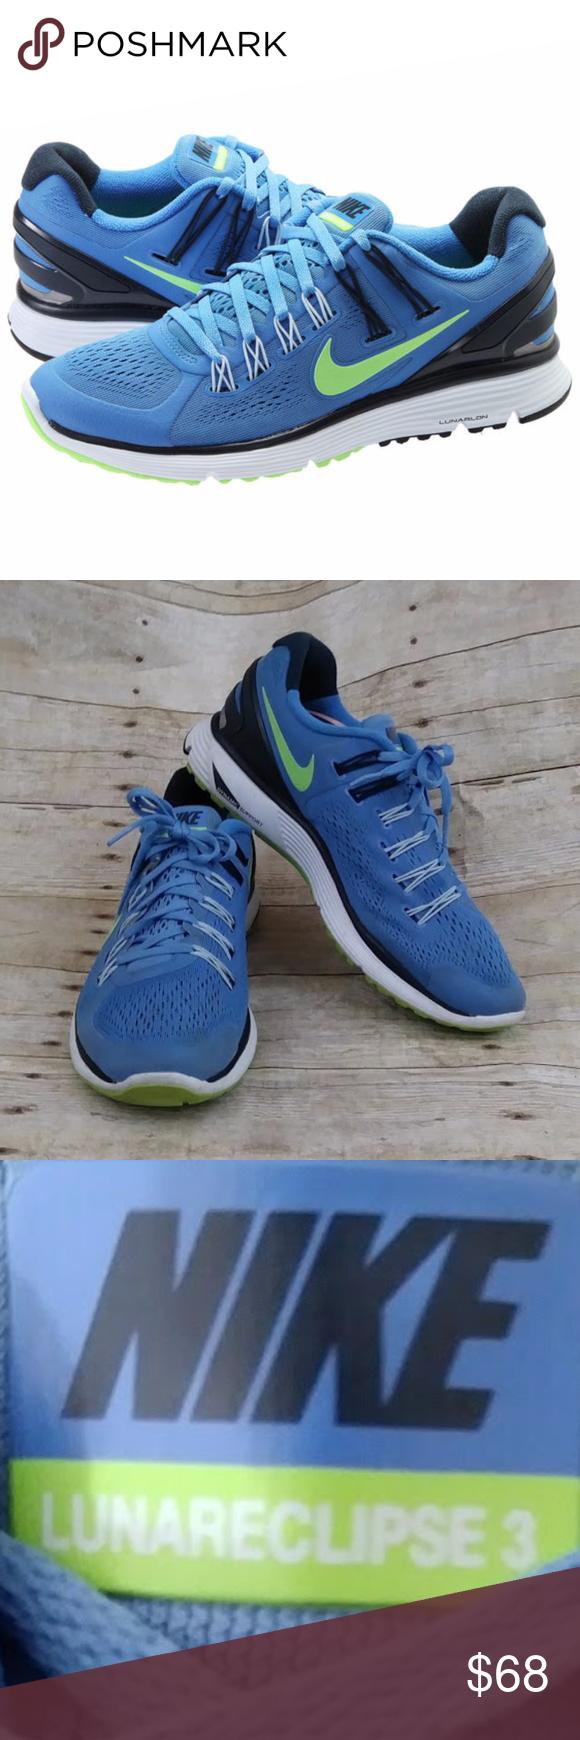 Nike Lunareclipse 3 Running Shoe Size 10 Snug Fit Color Blue And